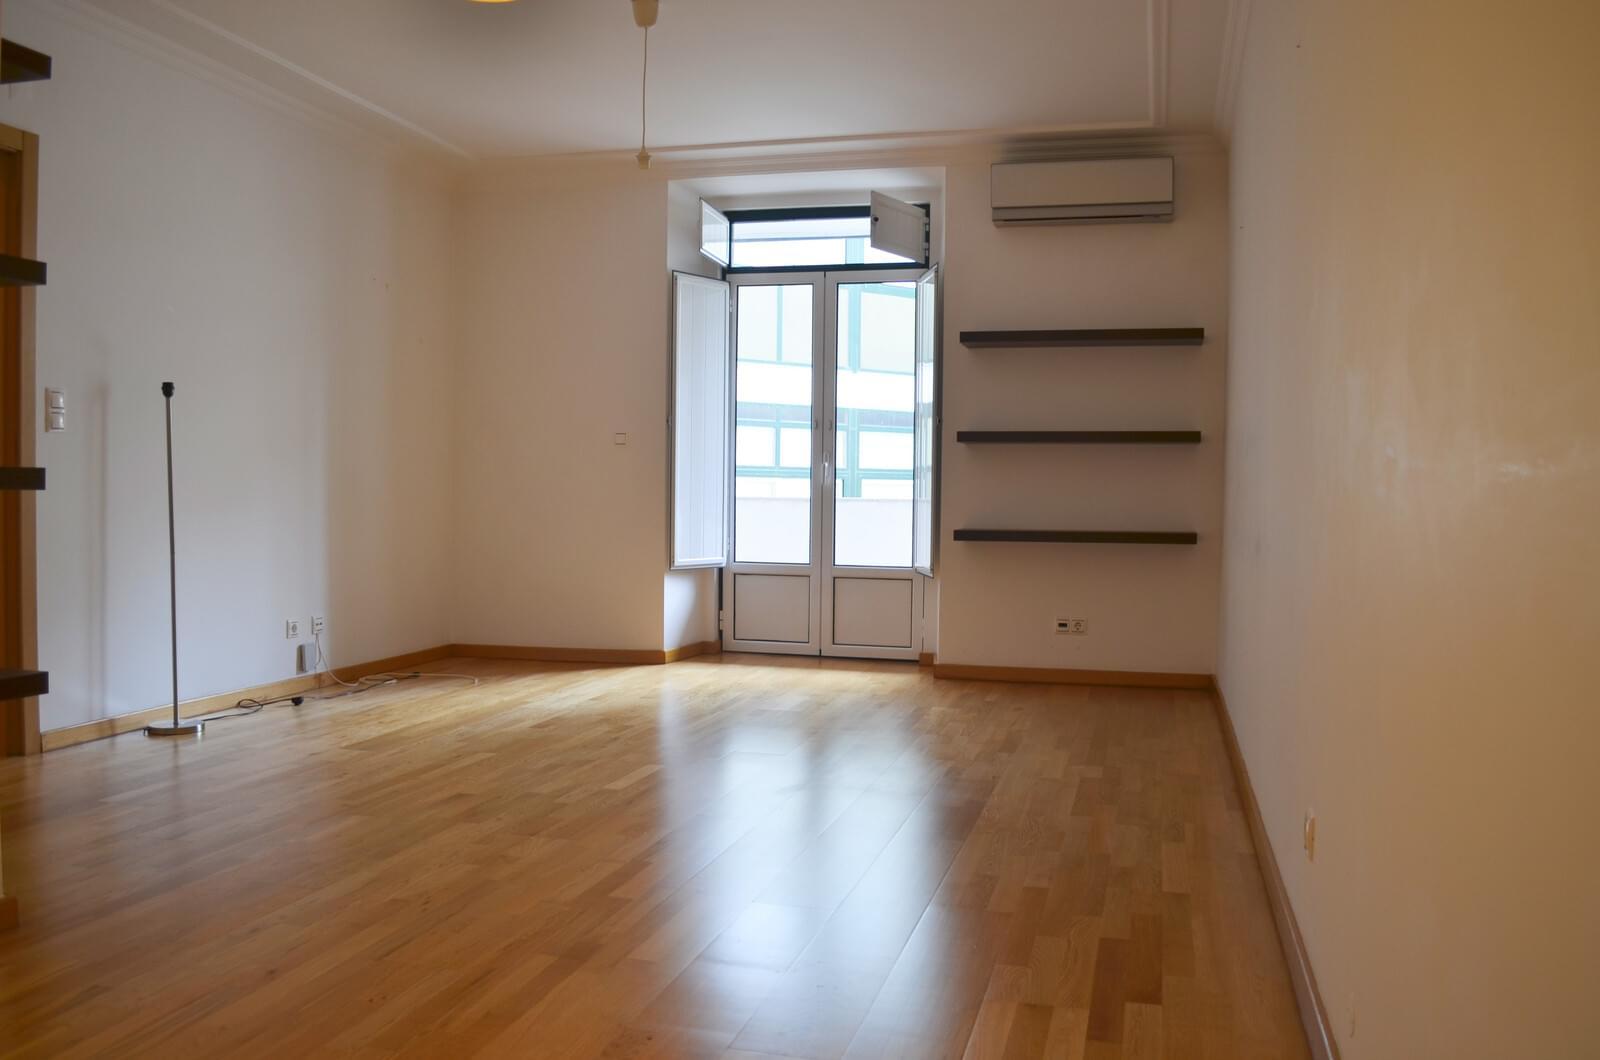 pf18839-apartamento-t2-lisboa-12697096-f1c1-487f-9629-d486e98f6126